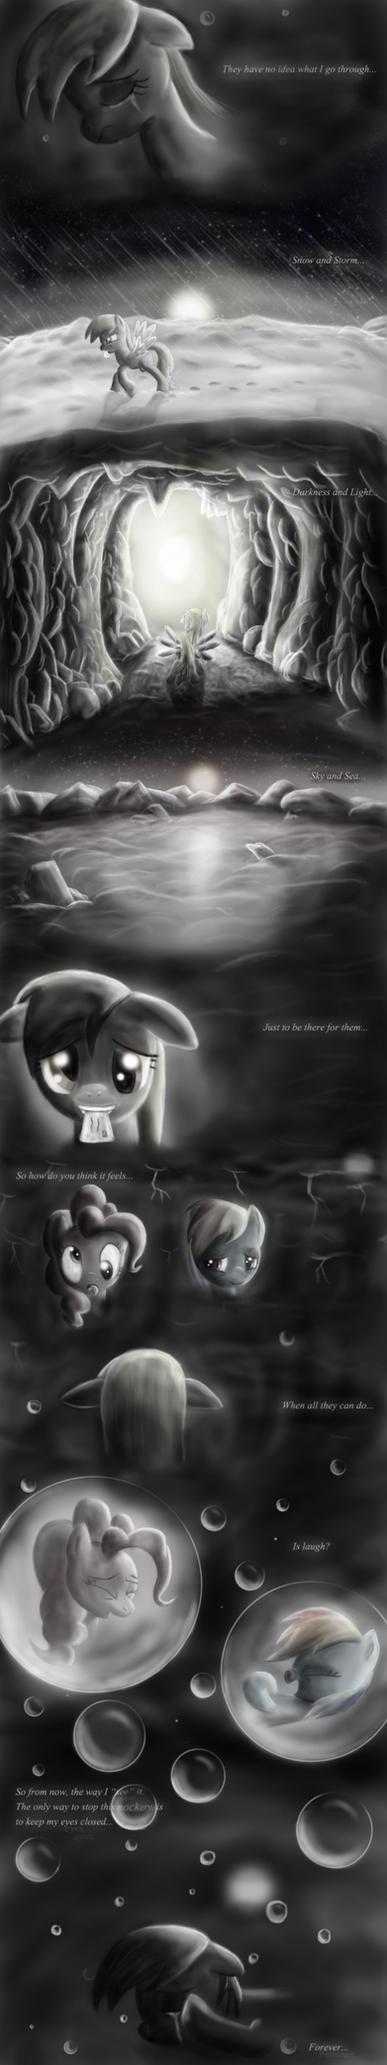 Derpy's Lament by SuneGem